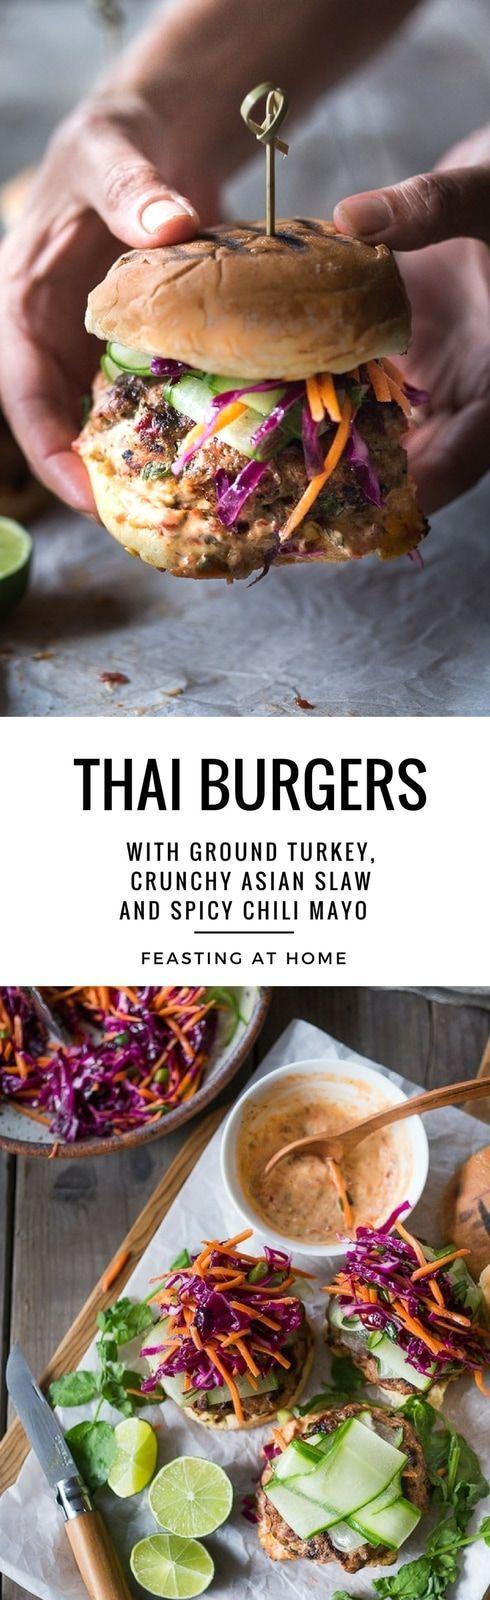 Thai Turkey Burgers with Crunchy Asian Slaw